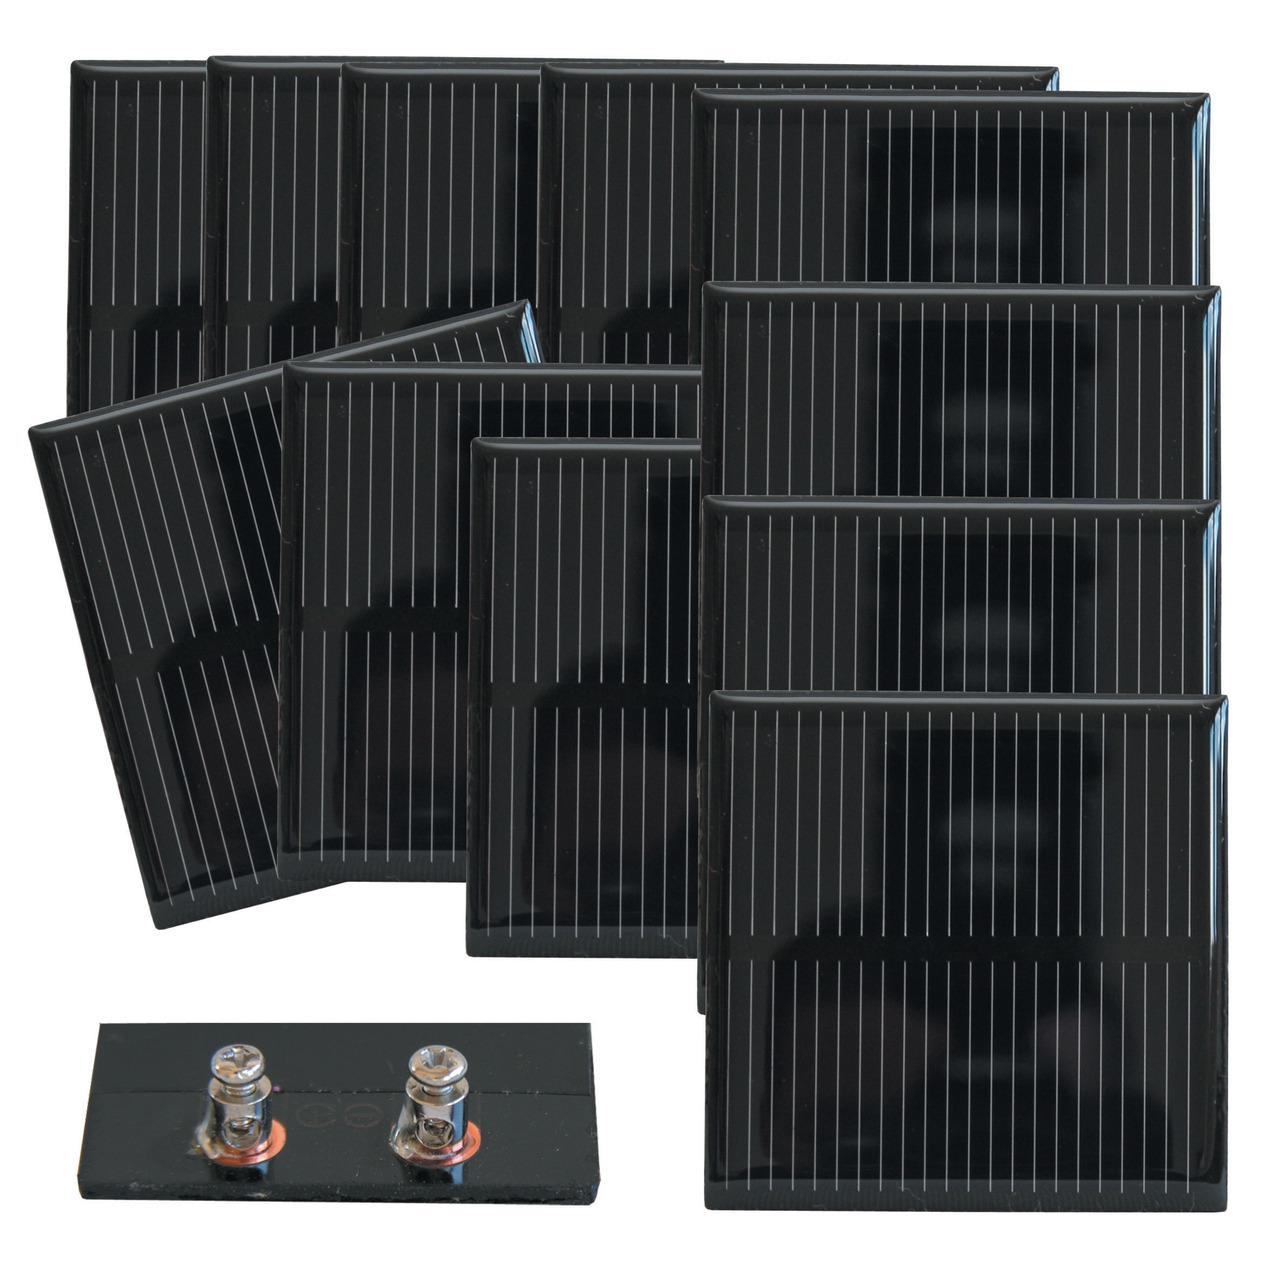 SOL-Expert Solarzelle SM85010S- vergossen- 10er Set